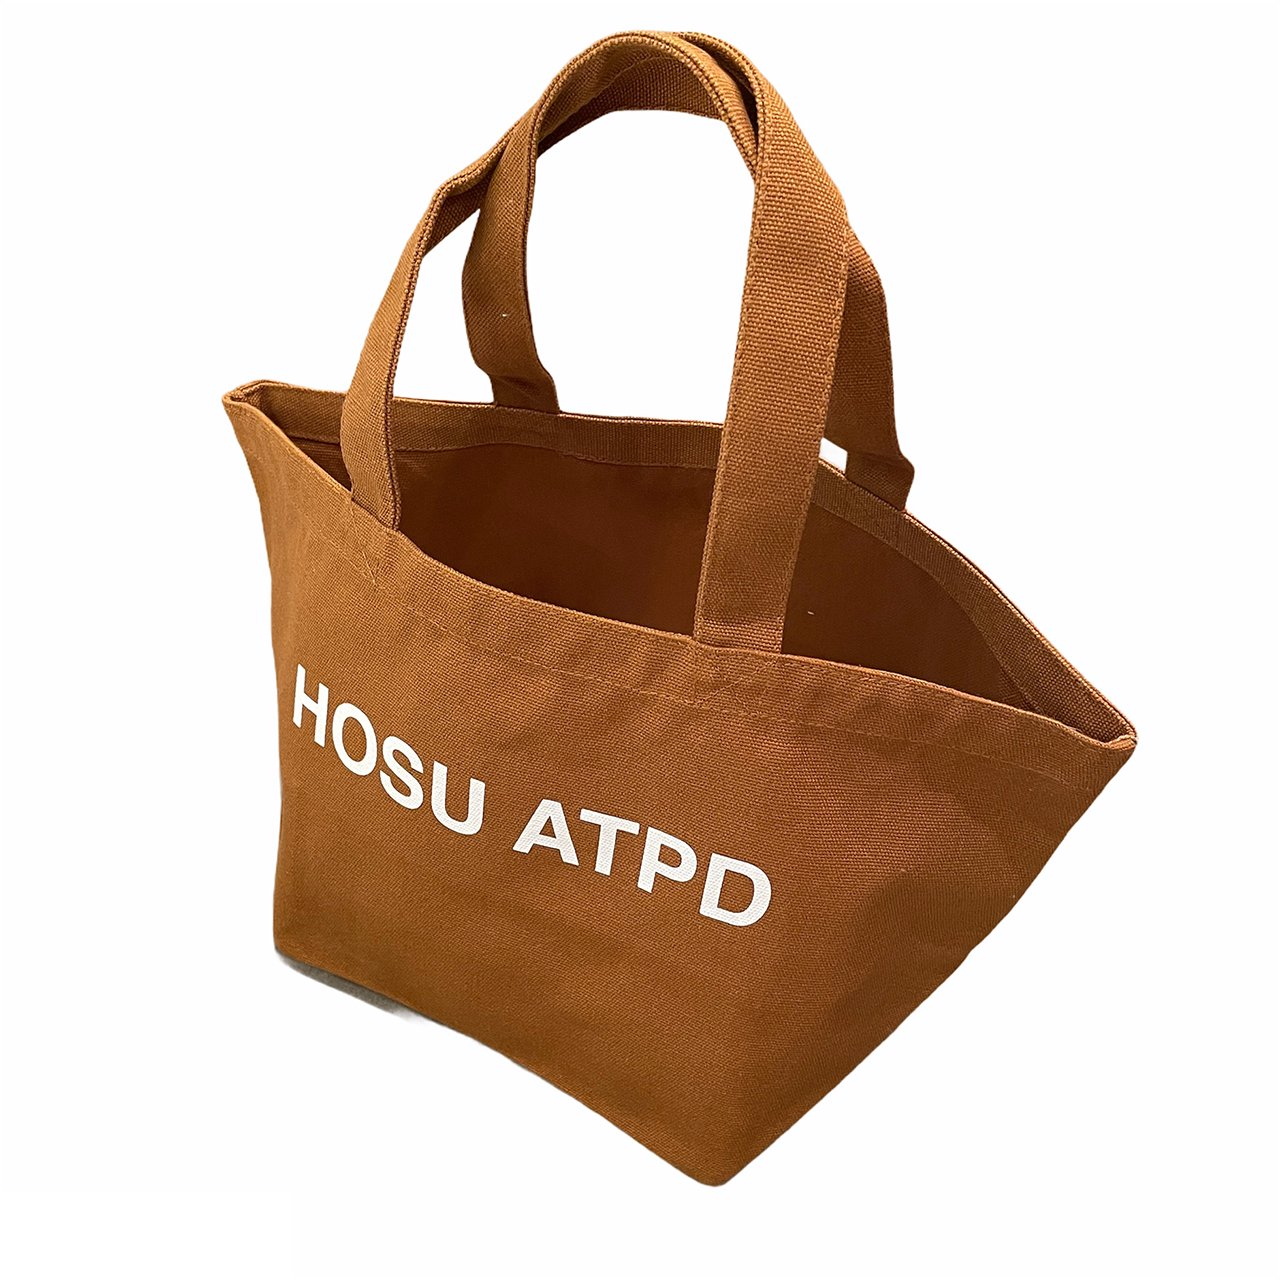 HOSU ロゴプリントランチバッグ/アイボリー、キャメル、ブラック